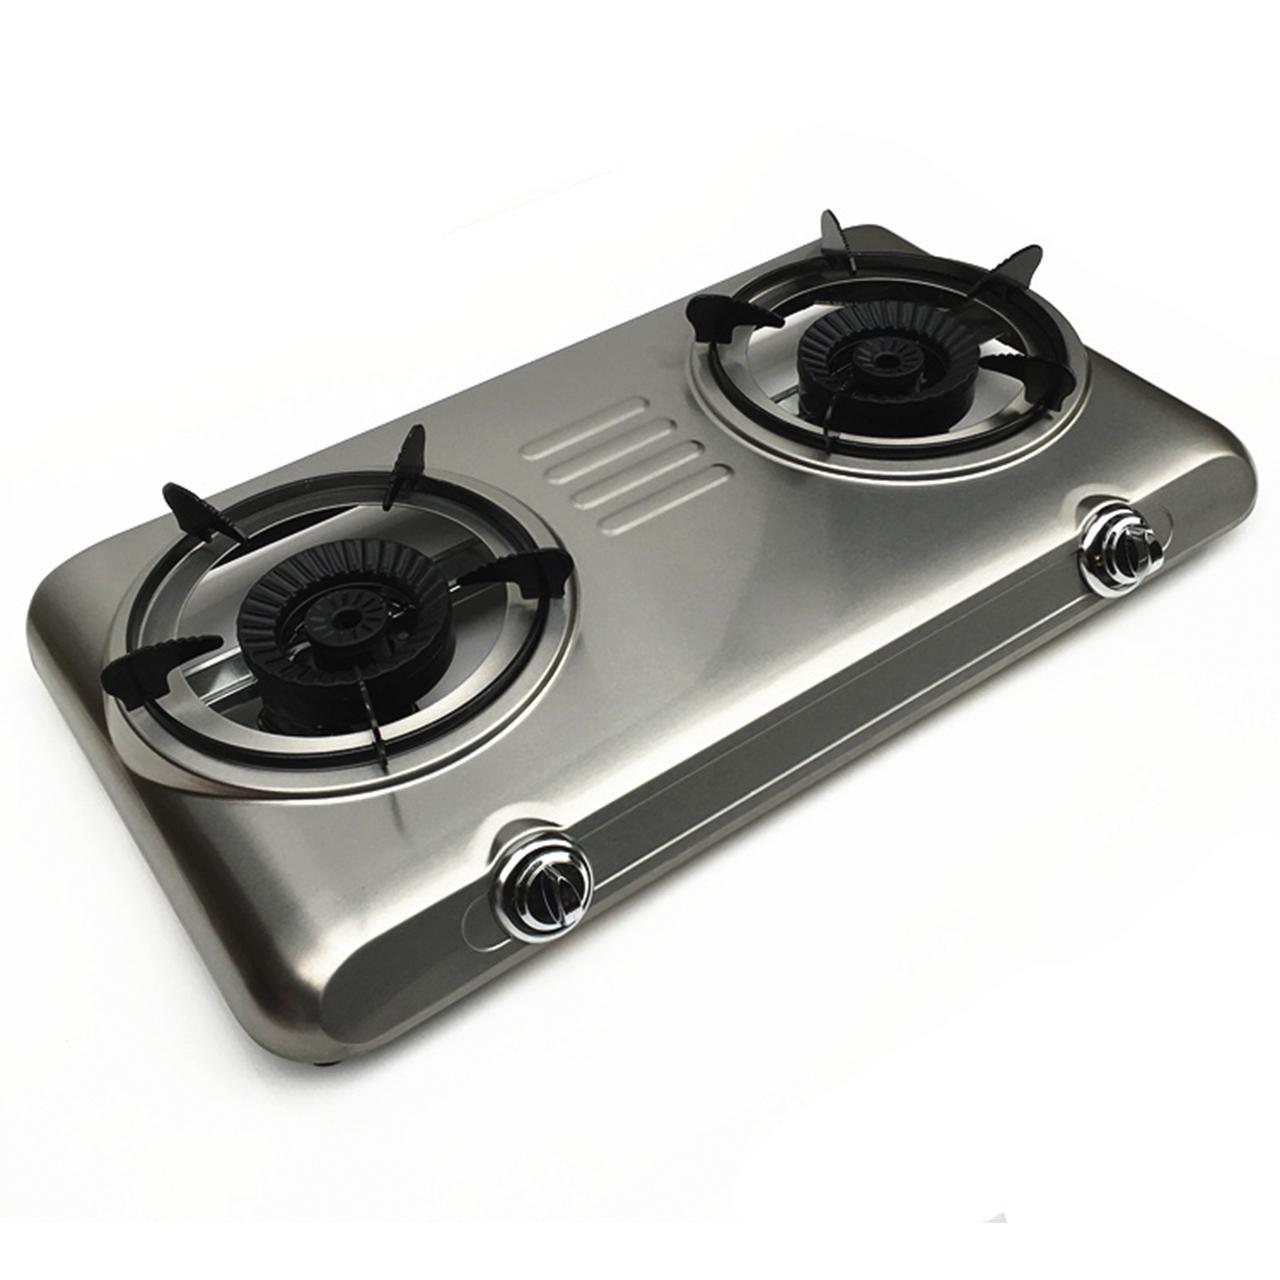 K2-T2S016W黑色旋火炉具,不锈钢灶具